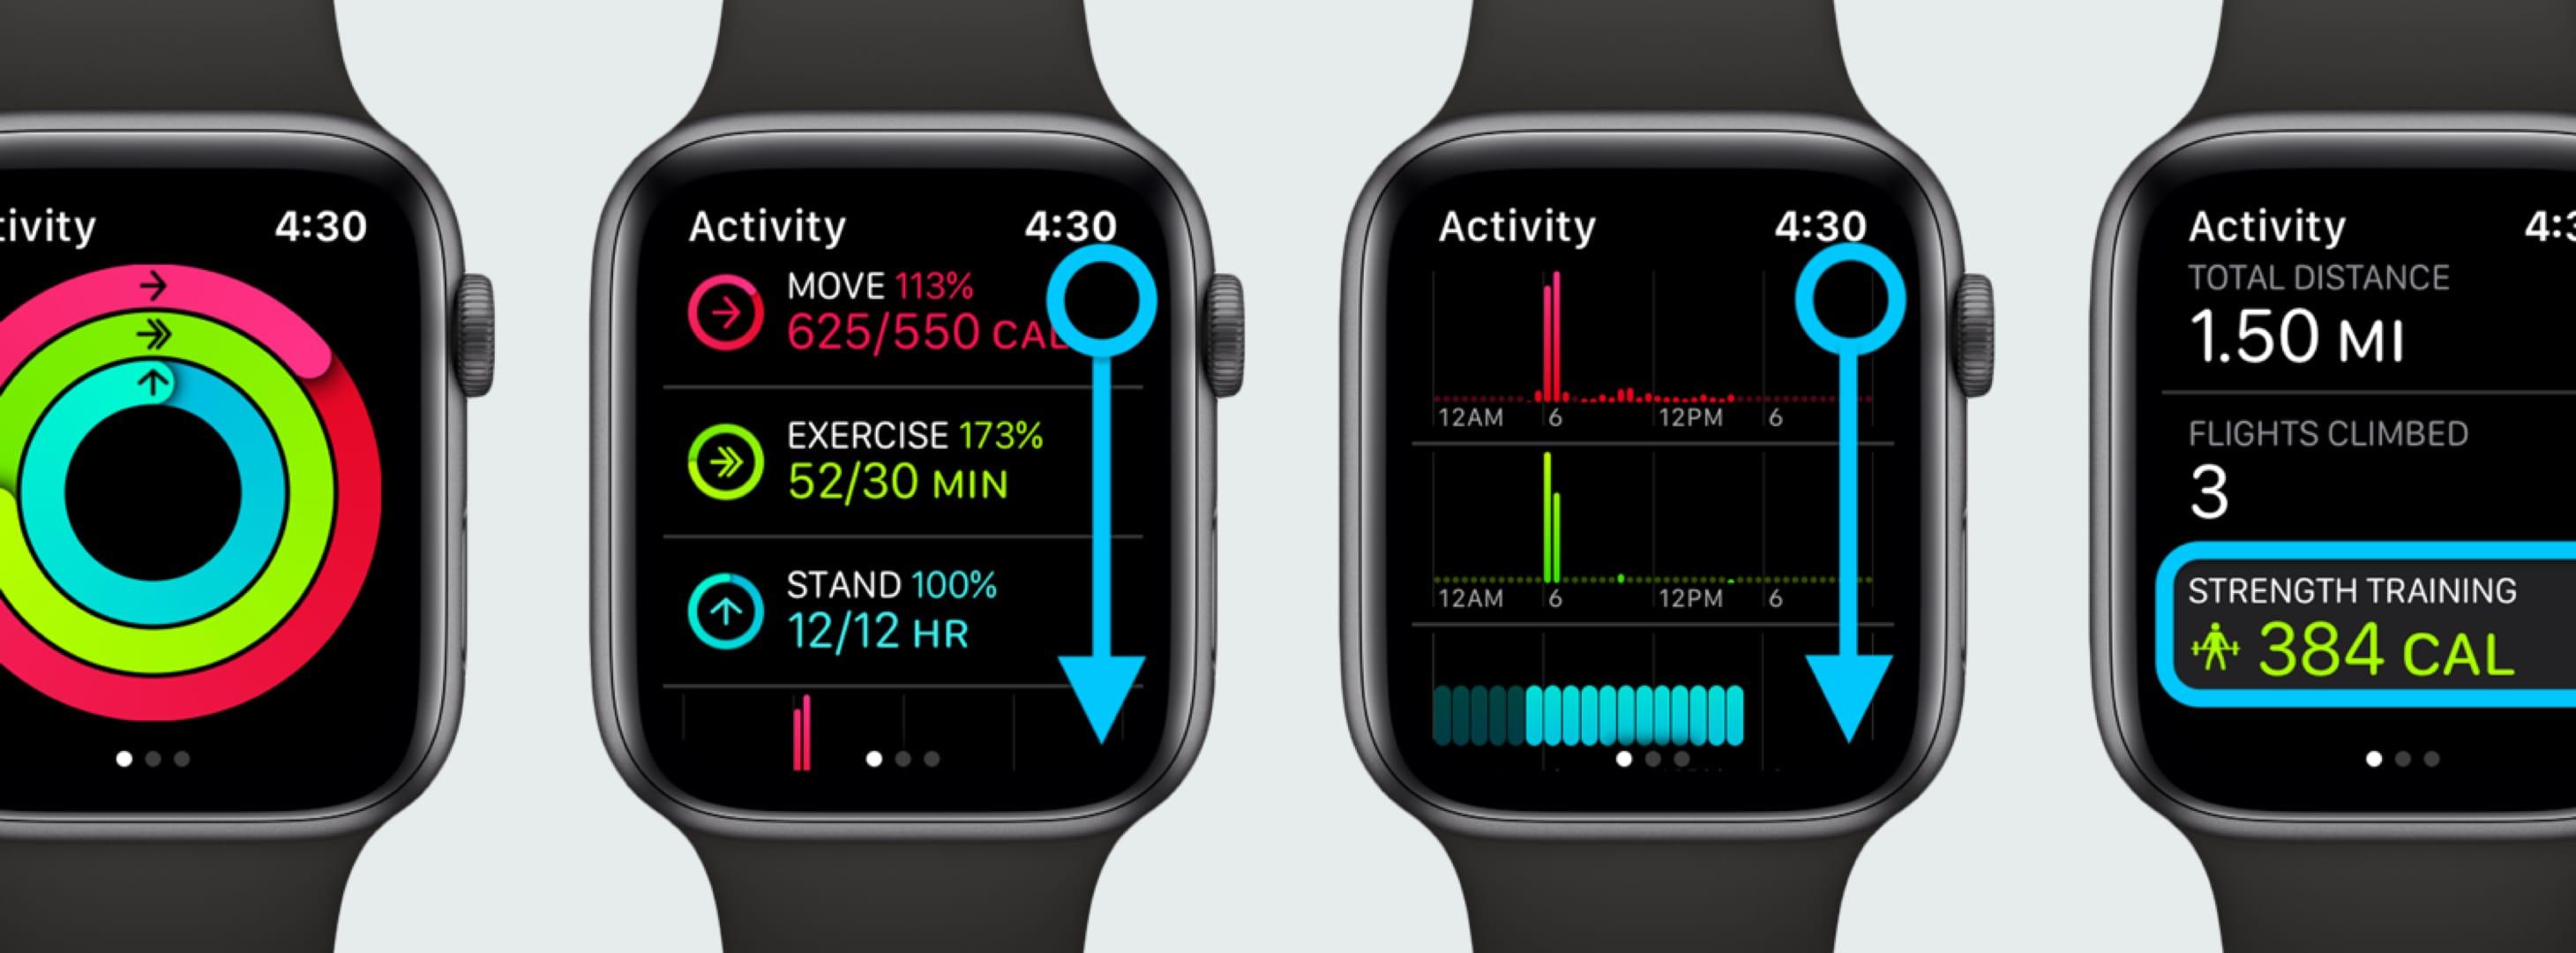 allapplenews-apple-watch-SE-workout-activity